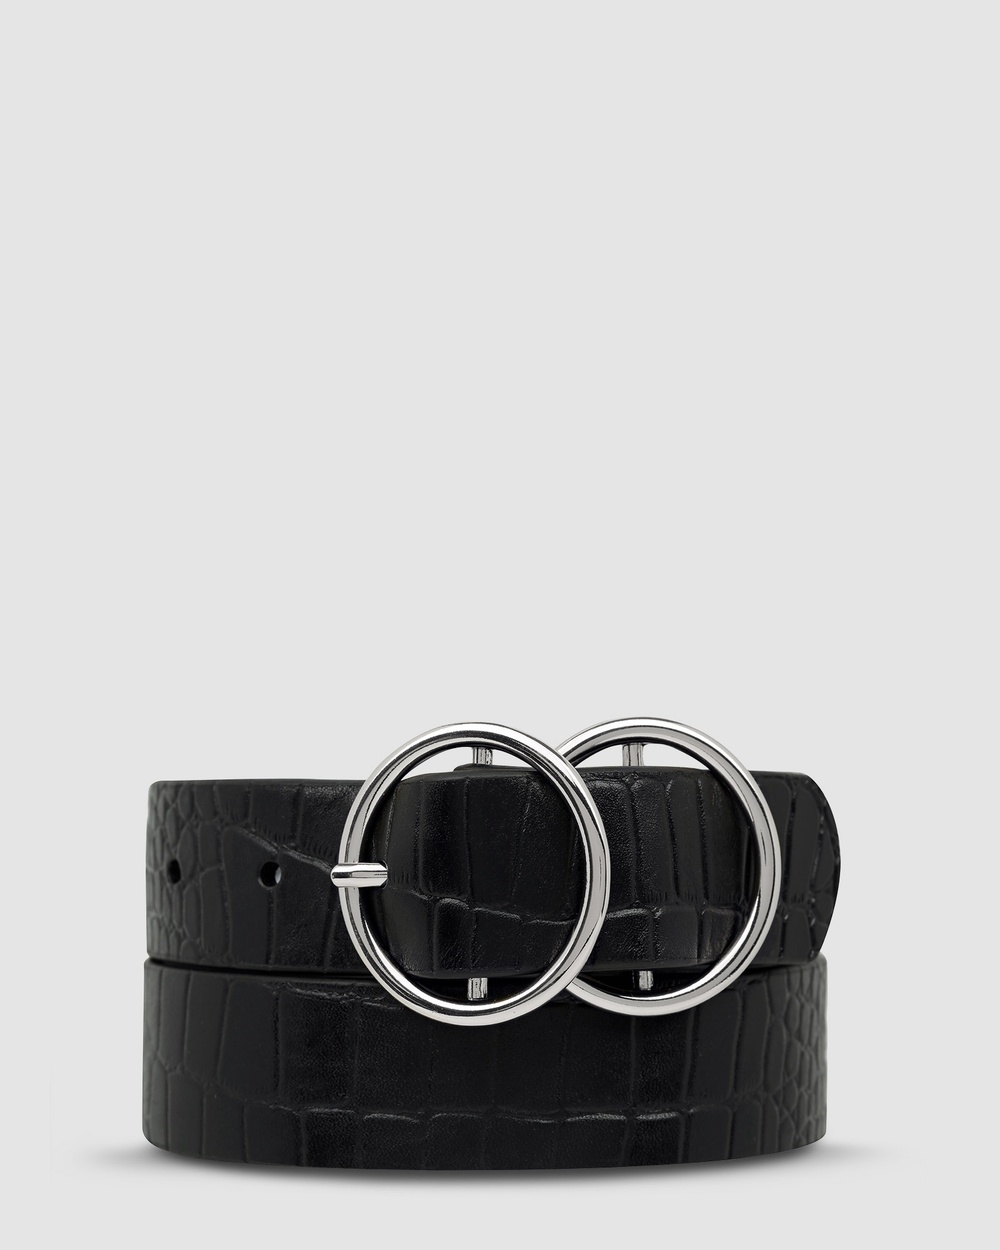 Status Anxiety Mislaid Belt Belts Black Croc/Silver